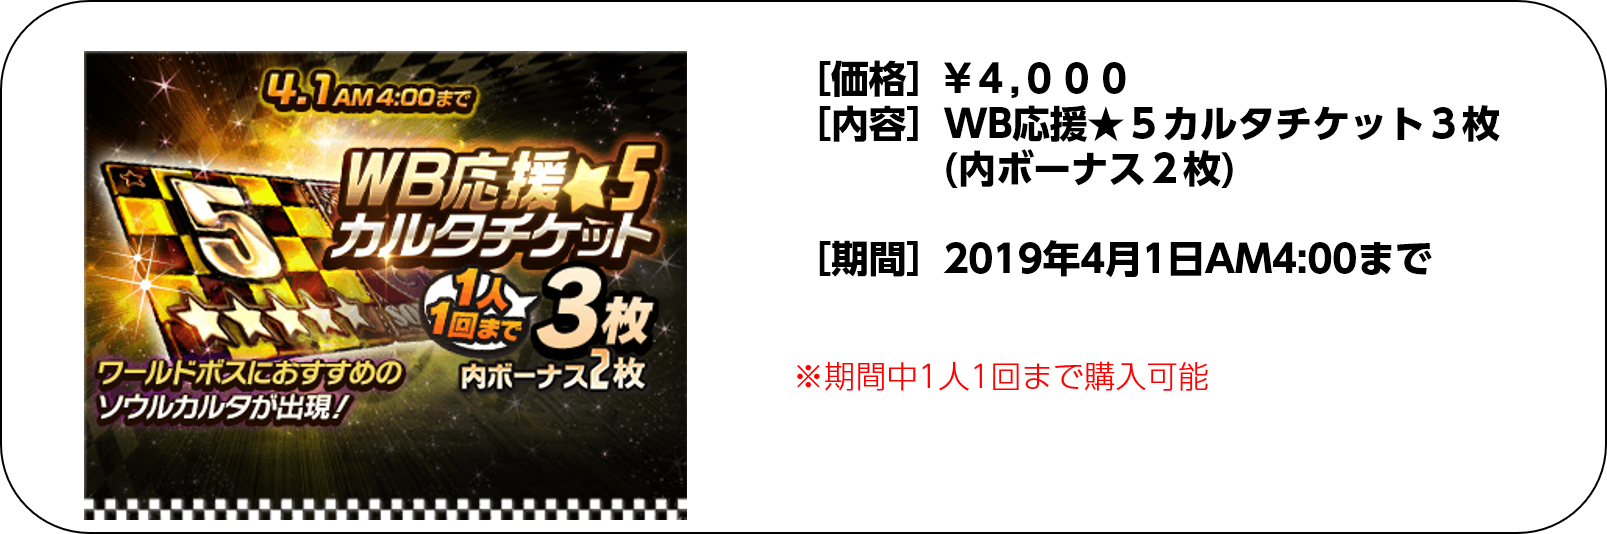 WB応援★5カルタチケット